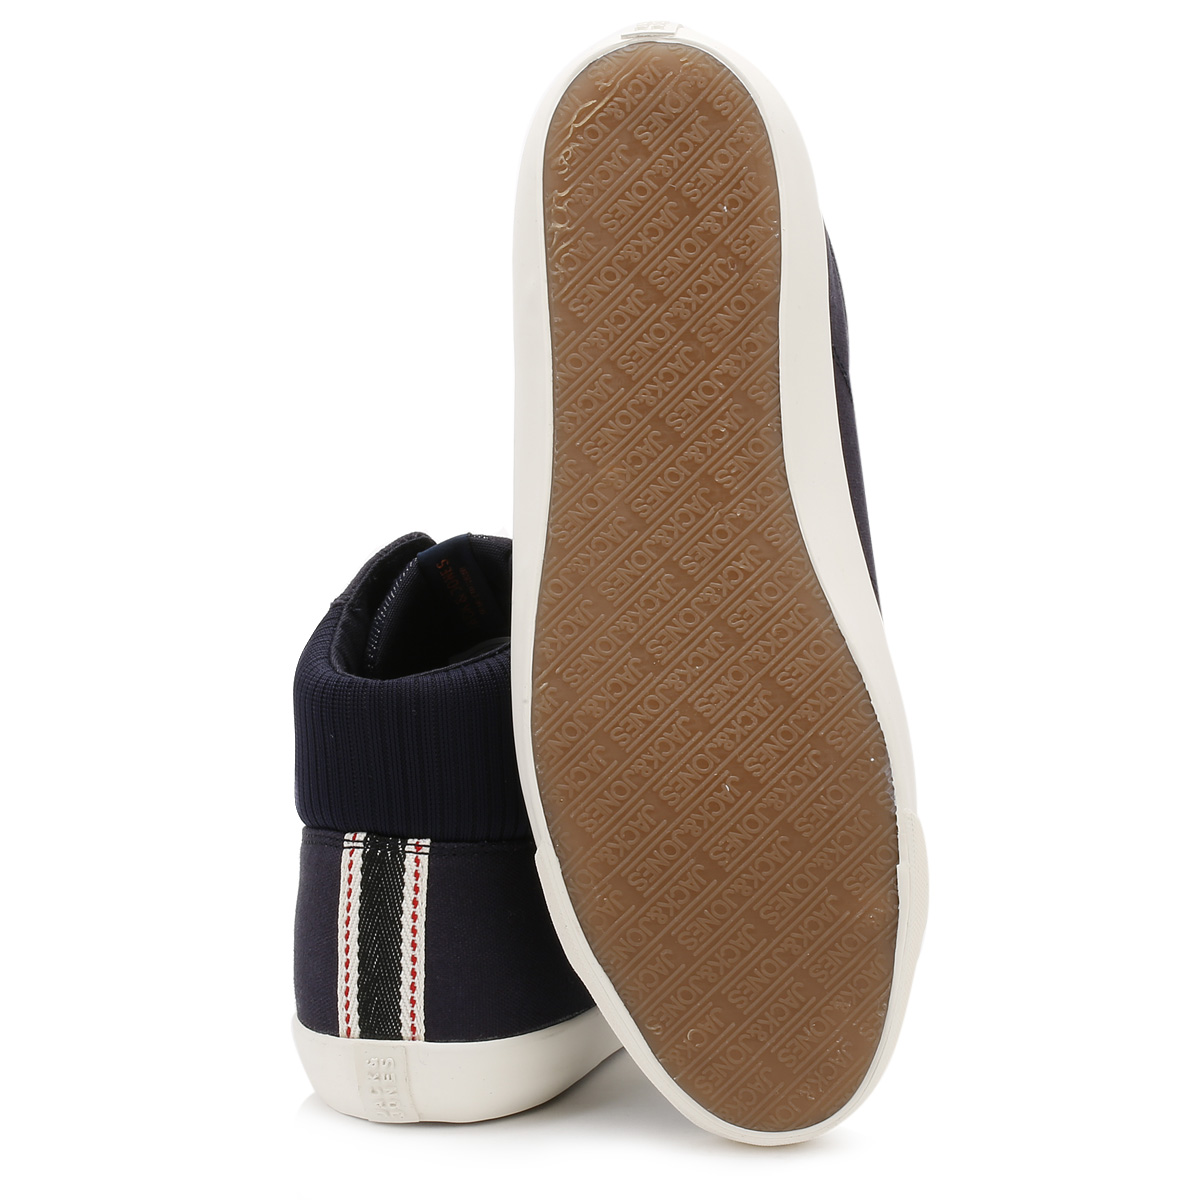 Jack & Jones Mens Lona Zapatillas, Azul Marino Blazer jfwdunmore, Zapatos informales